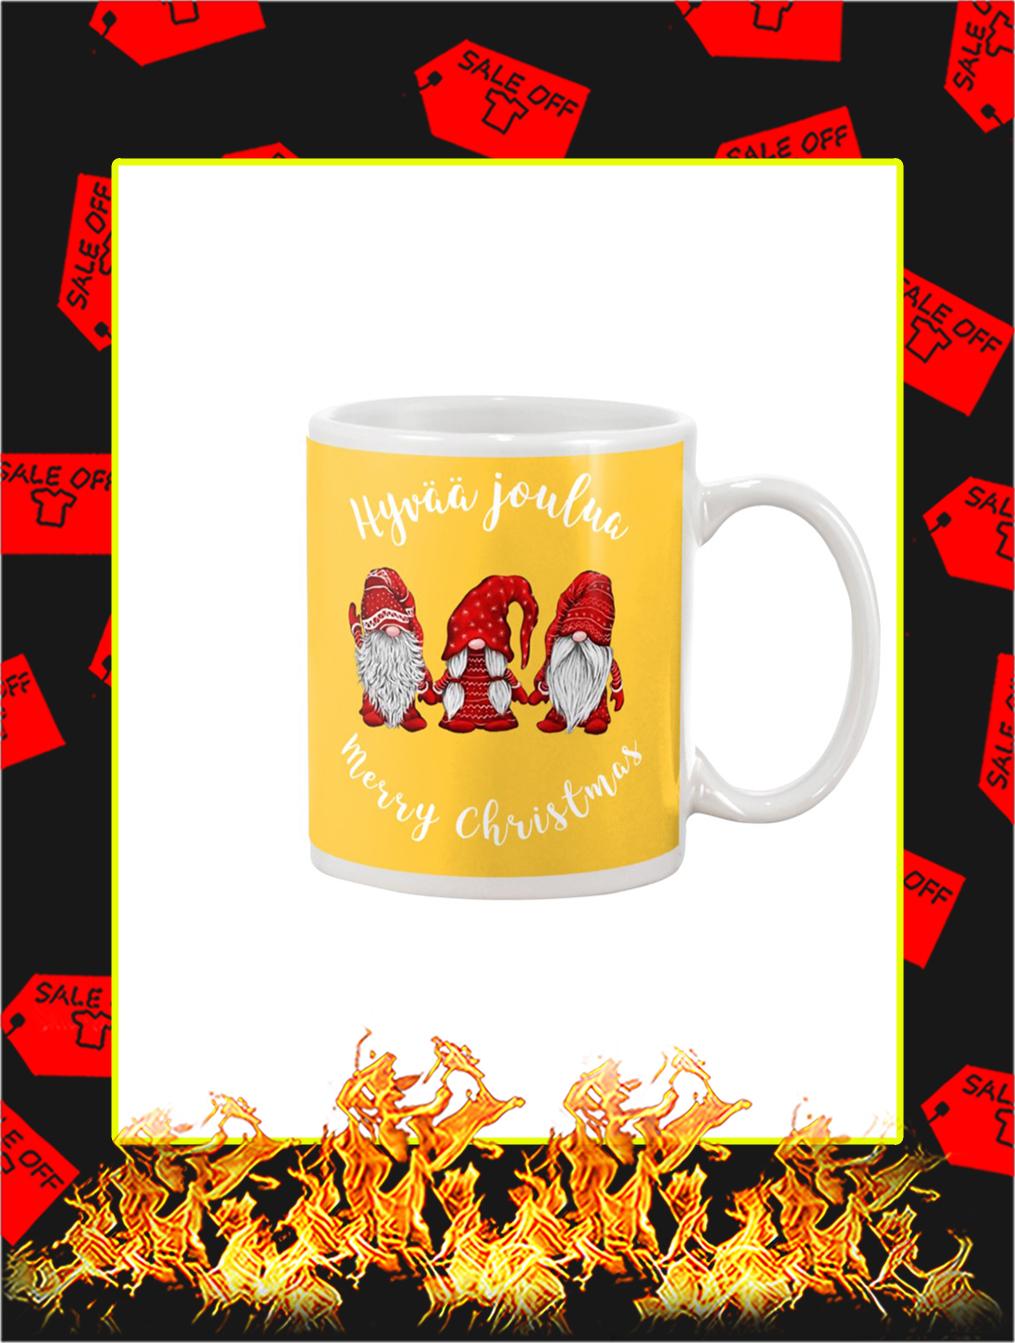 Gnomies Hyvaa Joulua Merry Christmas Mug- gold